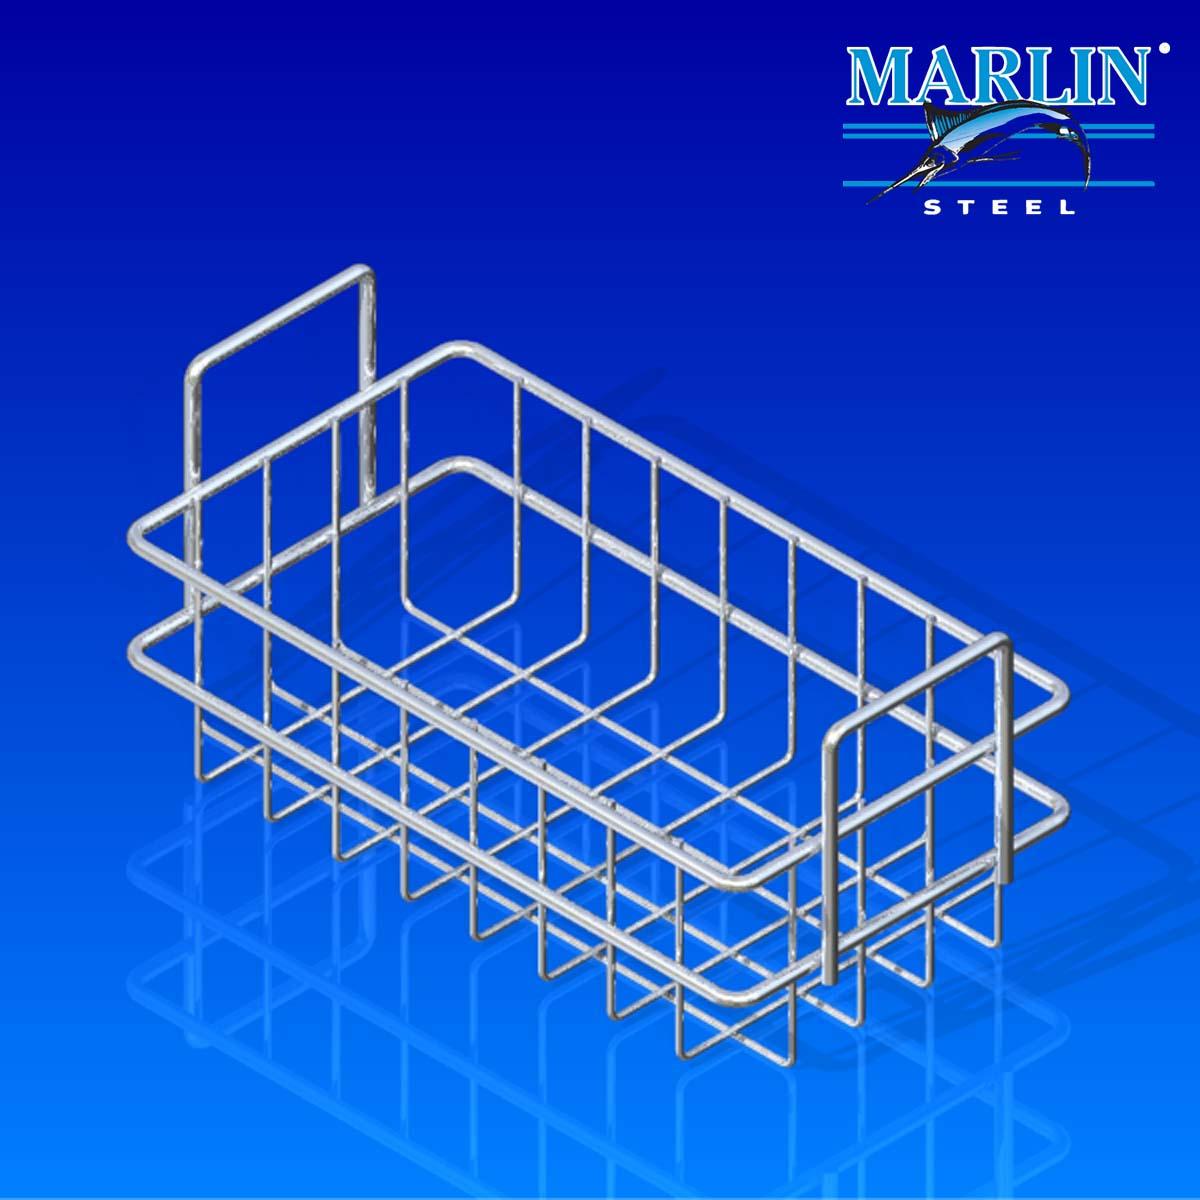 Marlin Steel Basket with Handles 893001